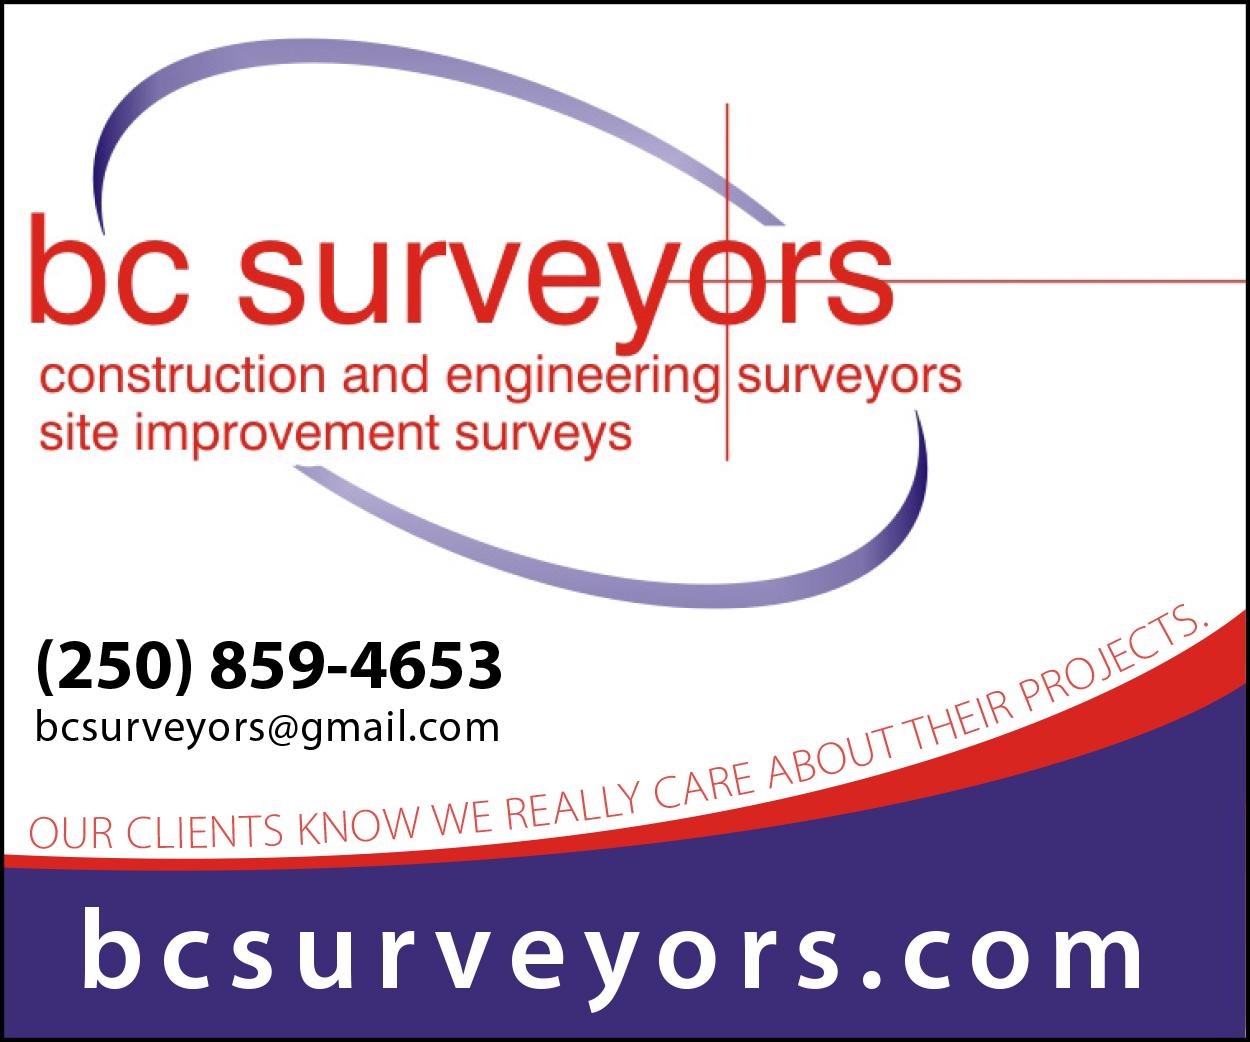 BC Surveyors